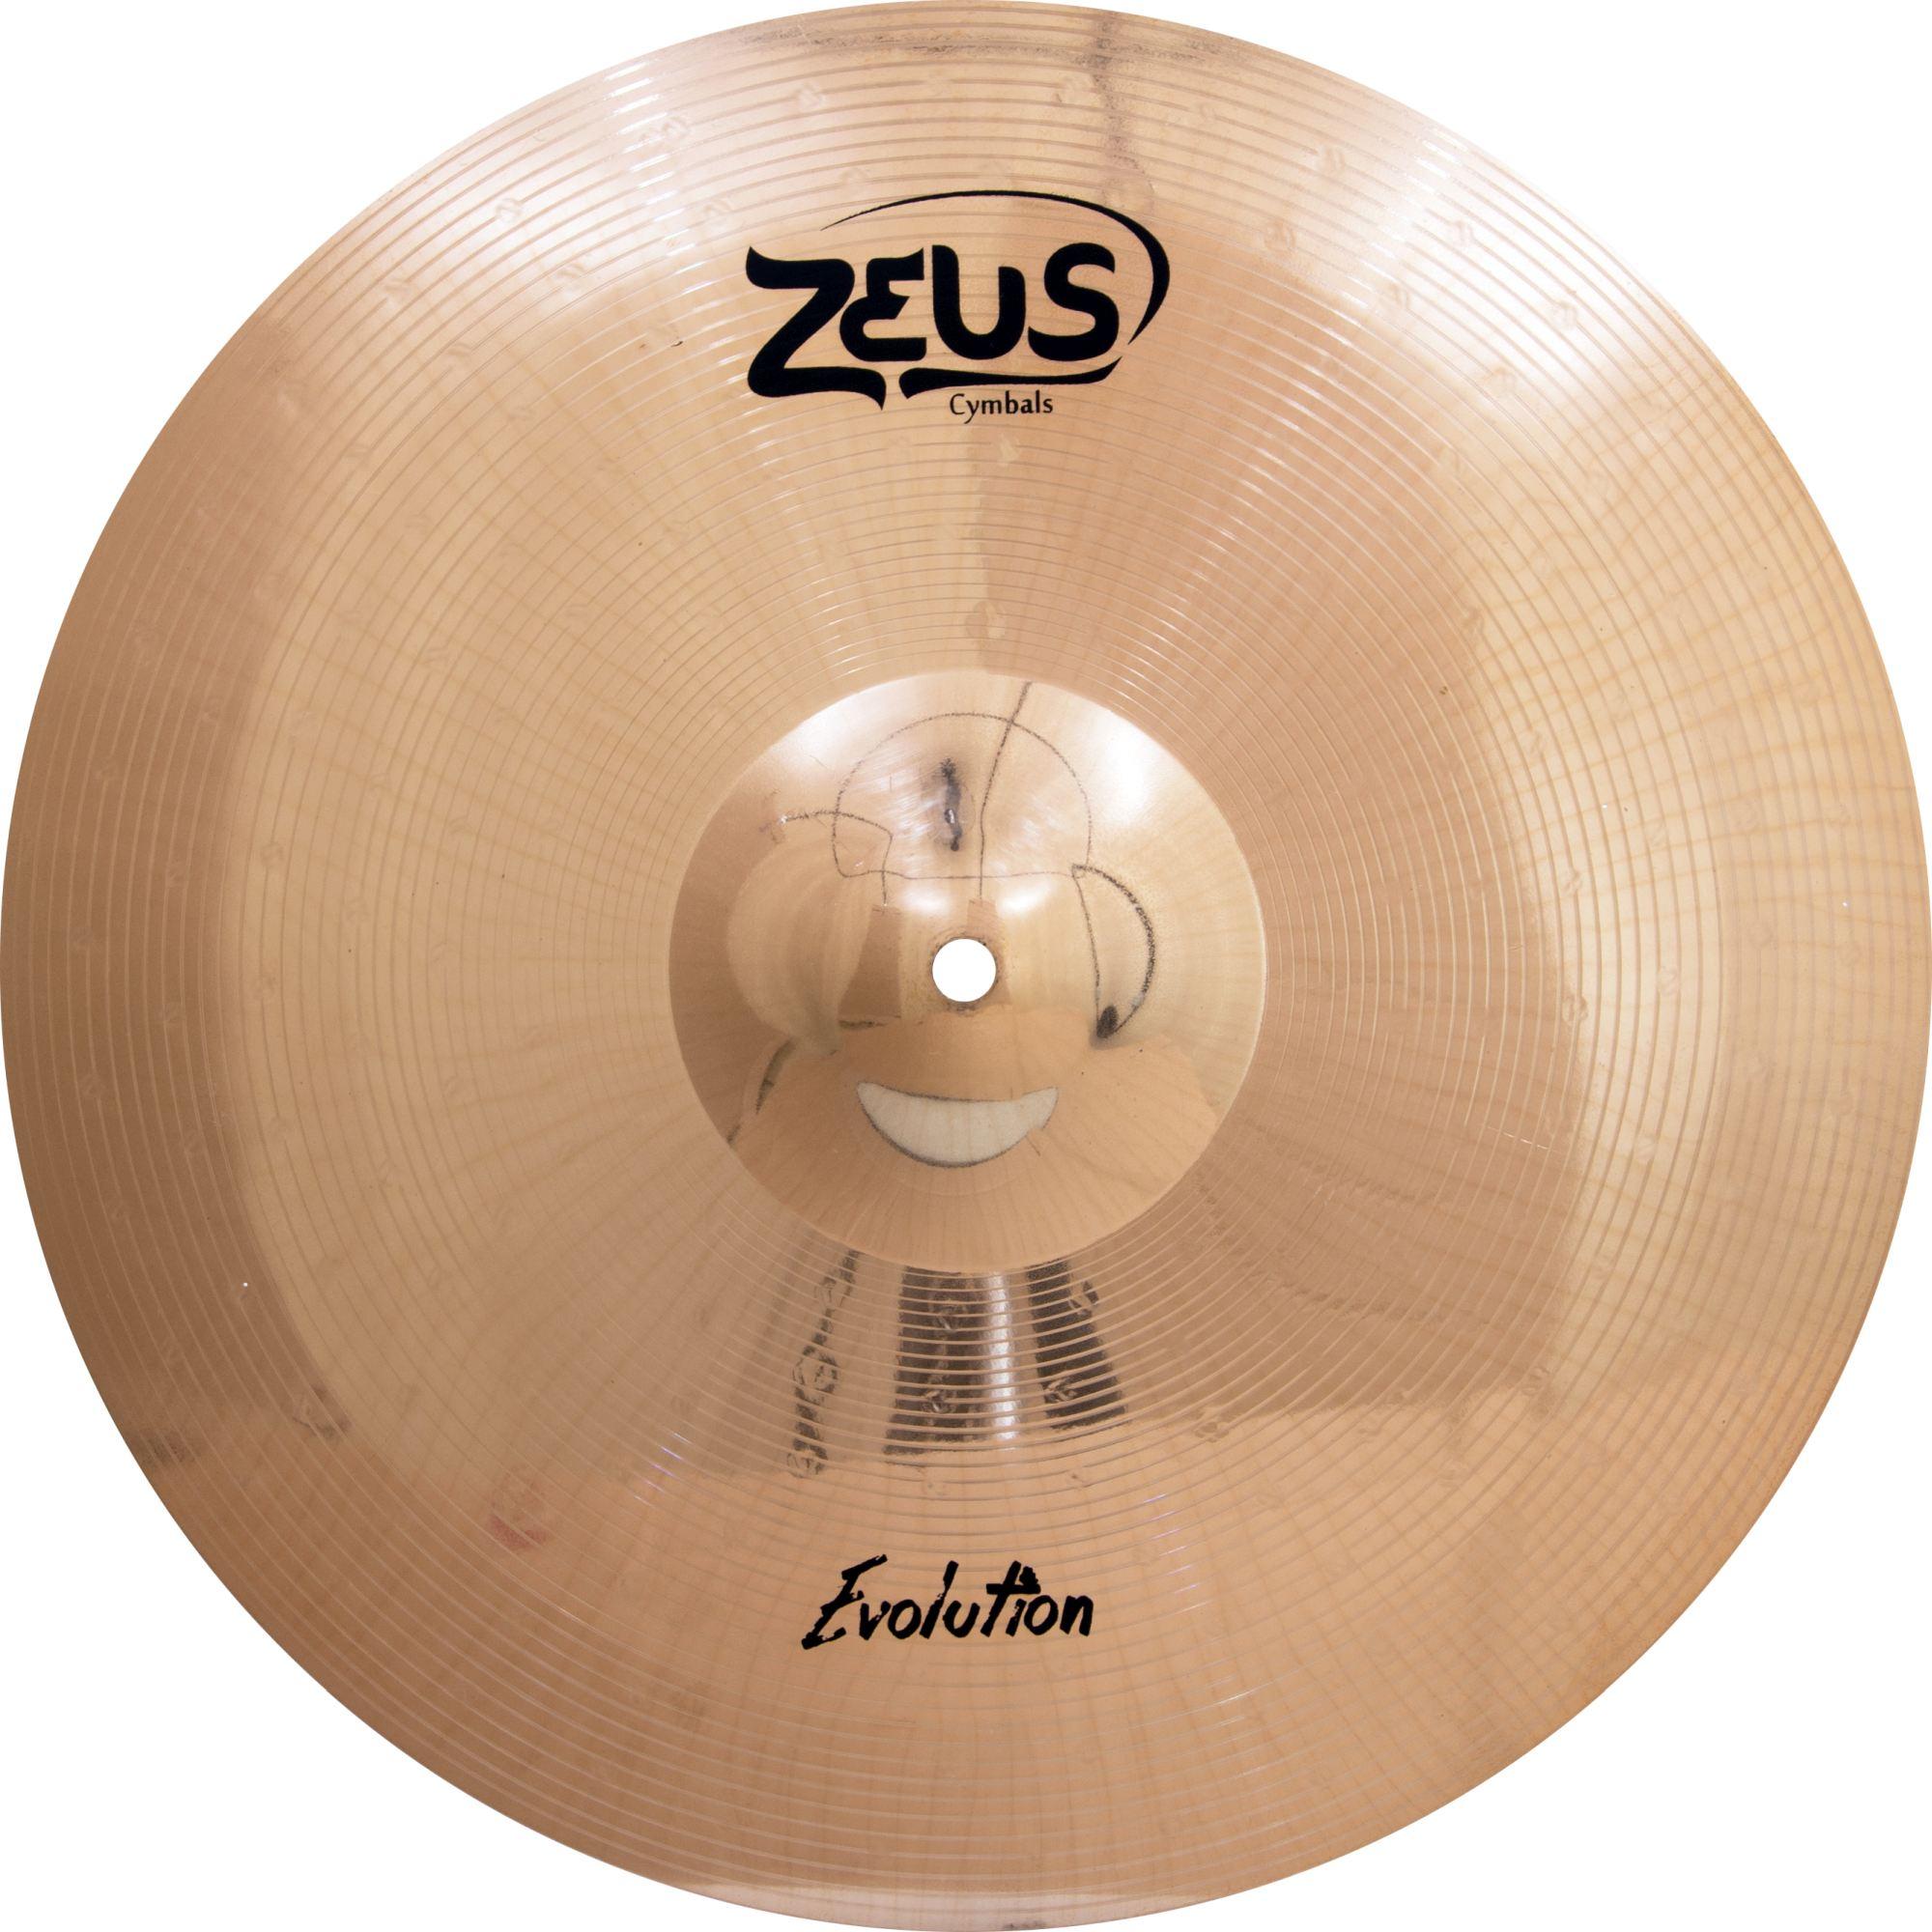 Prato Zeus Evolution Crash 18 Zevc18